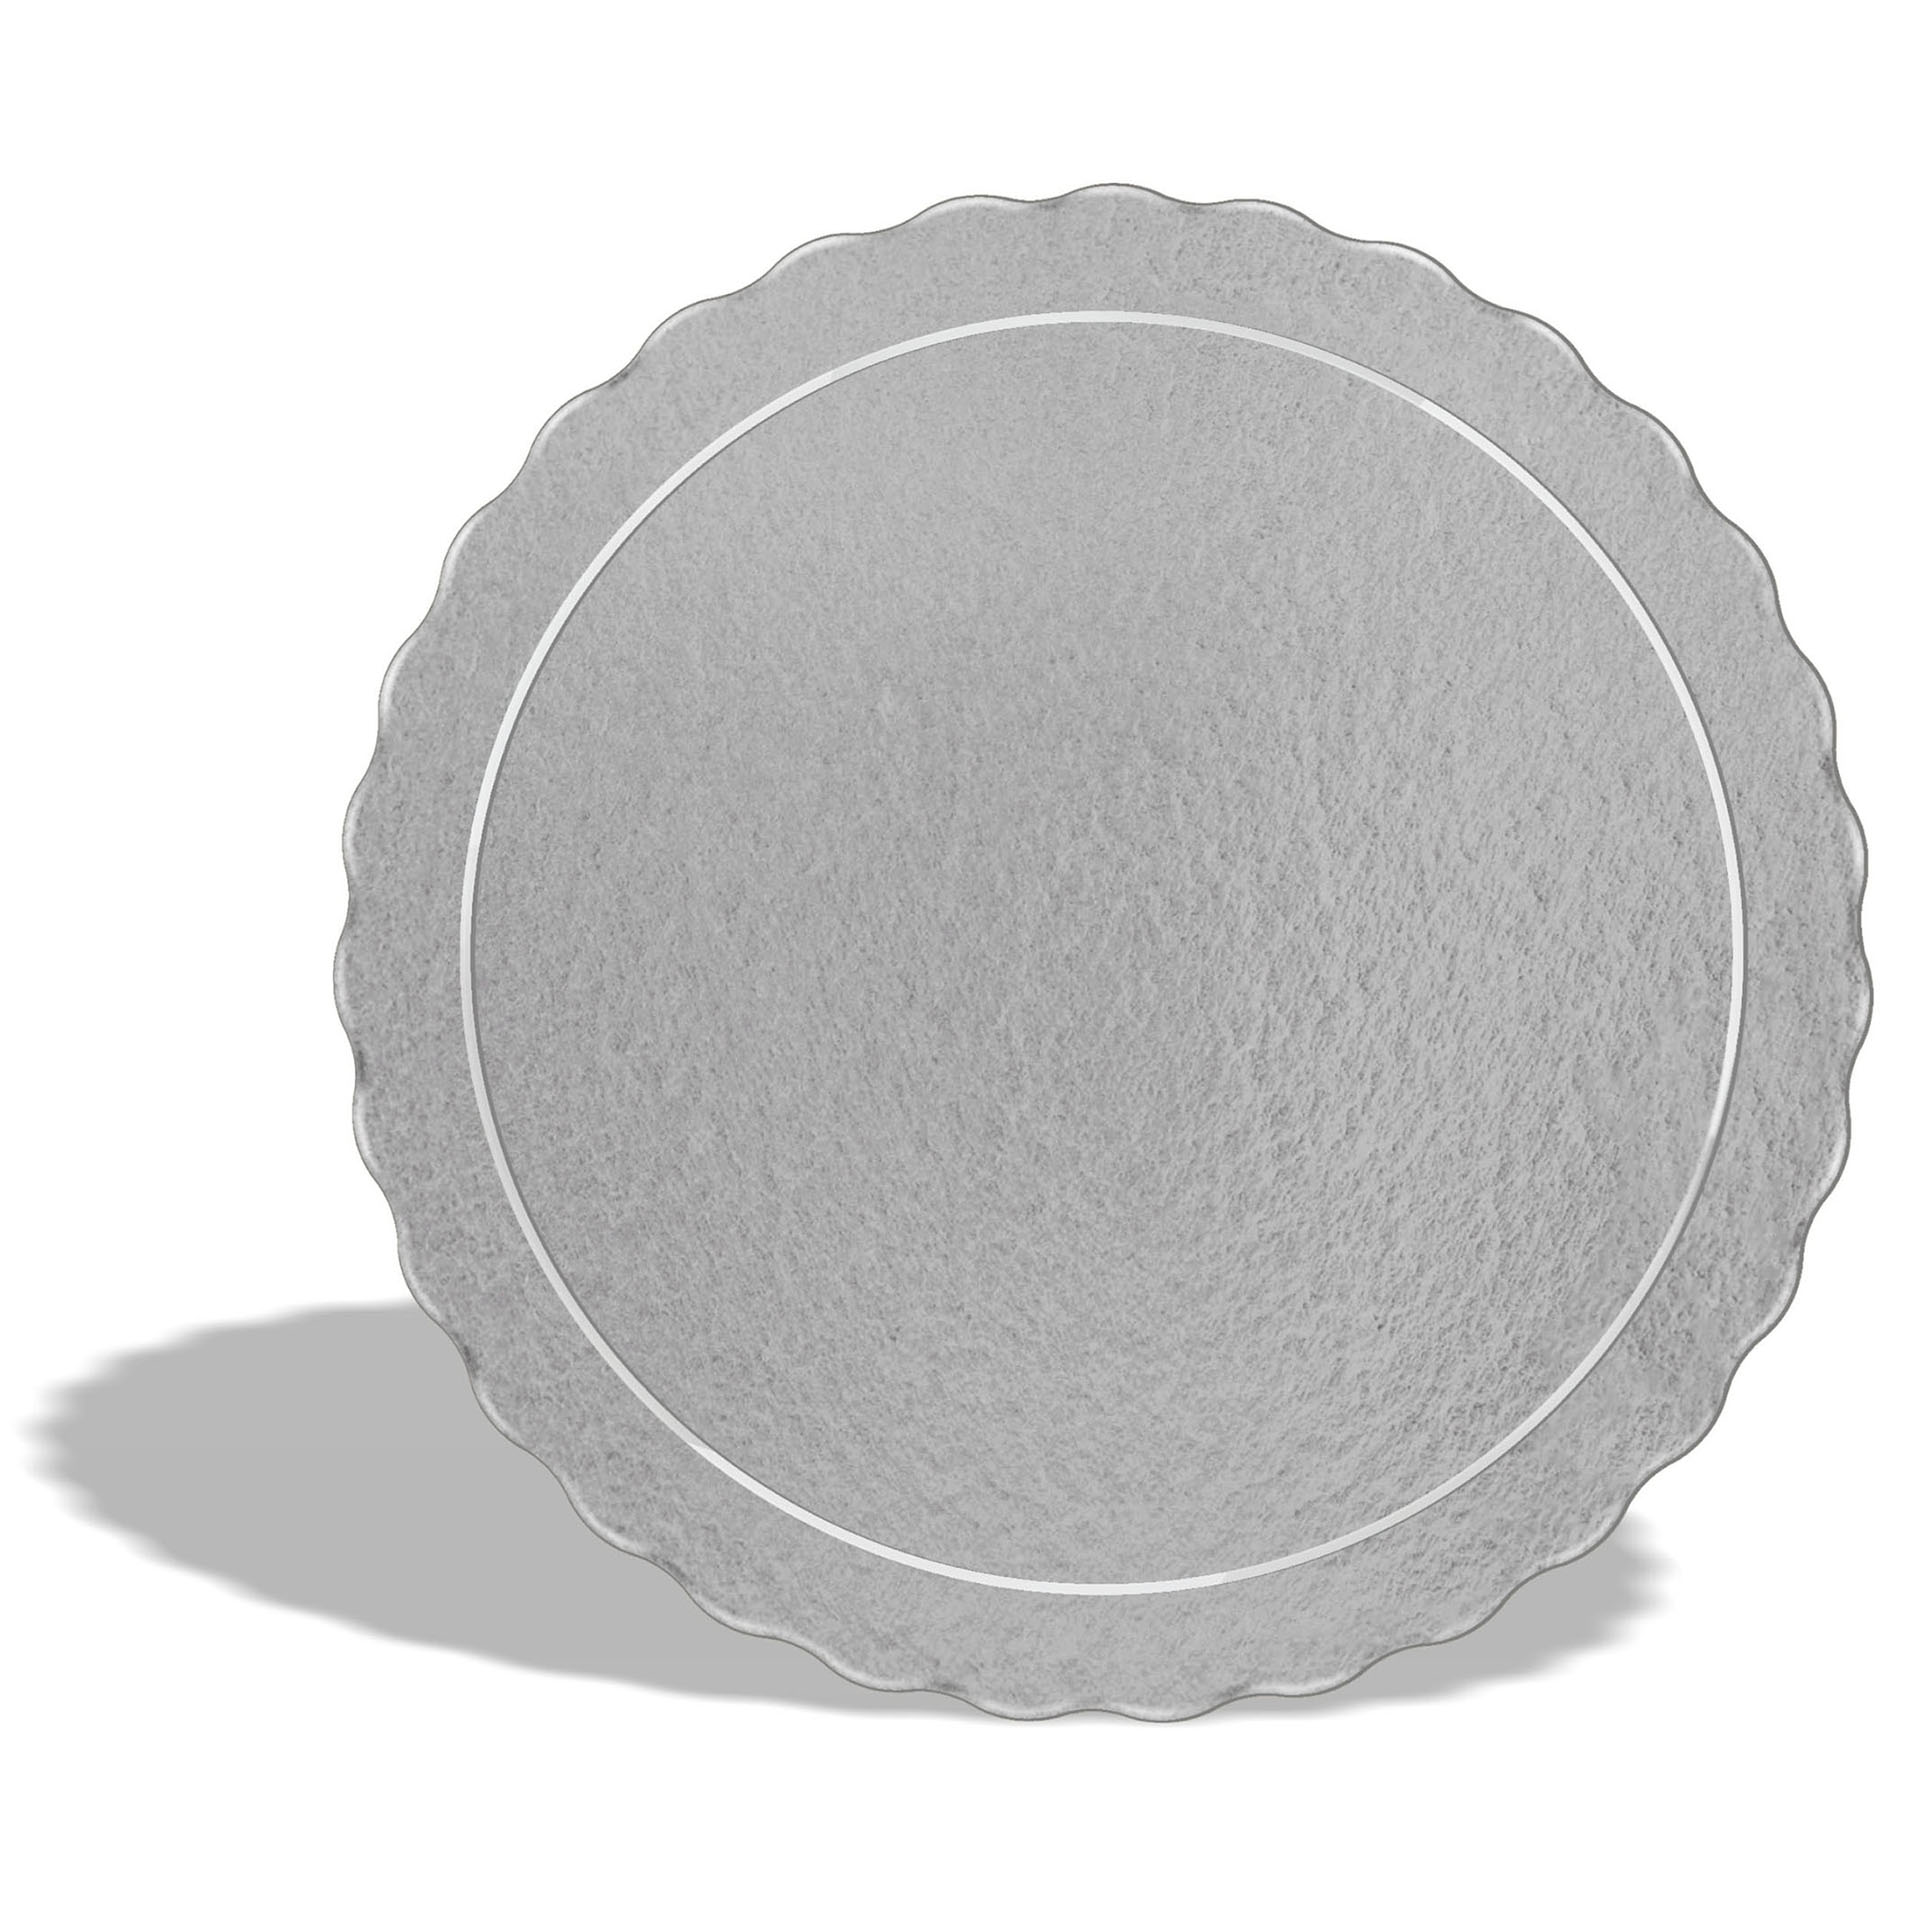 Kit 60 Bases Laminadas Para Bolo, Cake Board, 25 e 30cm - Prata